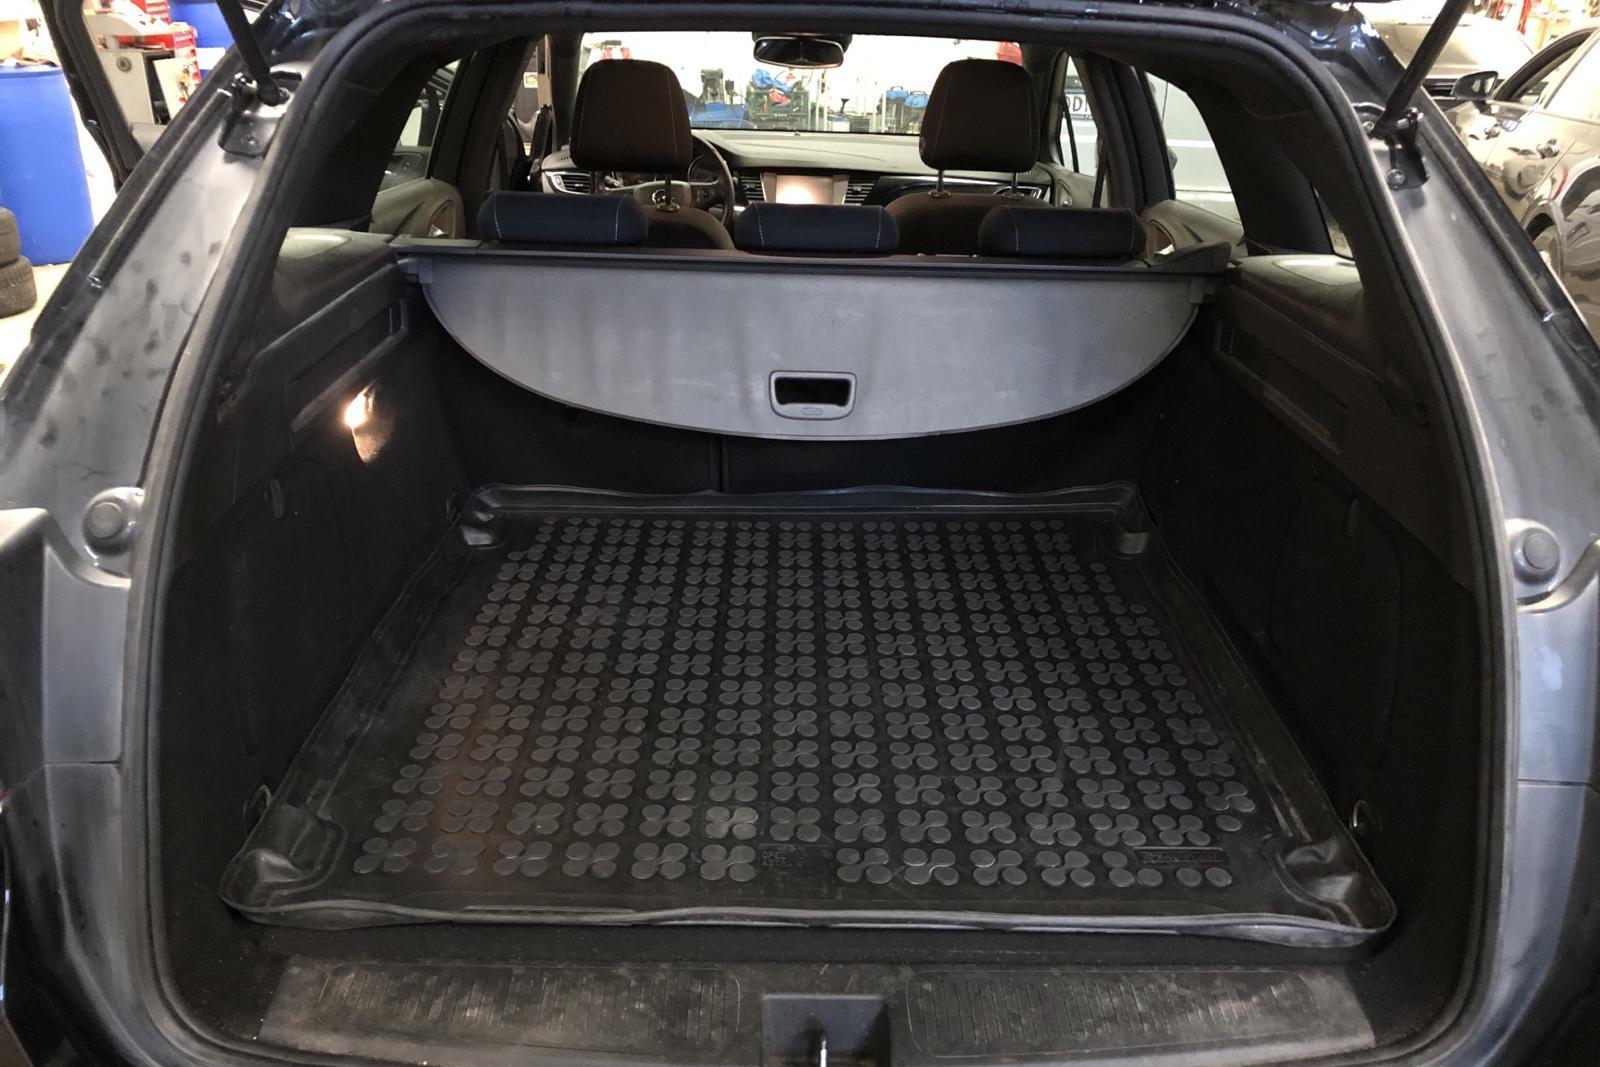 Opel Astra 1.4 Turbo ECOTEC SportsTourer (150hk) - 32 000 km - black - 2017